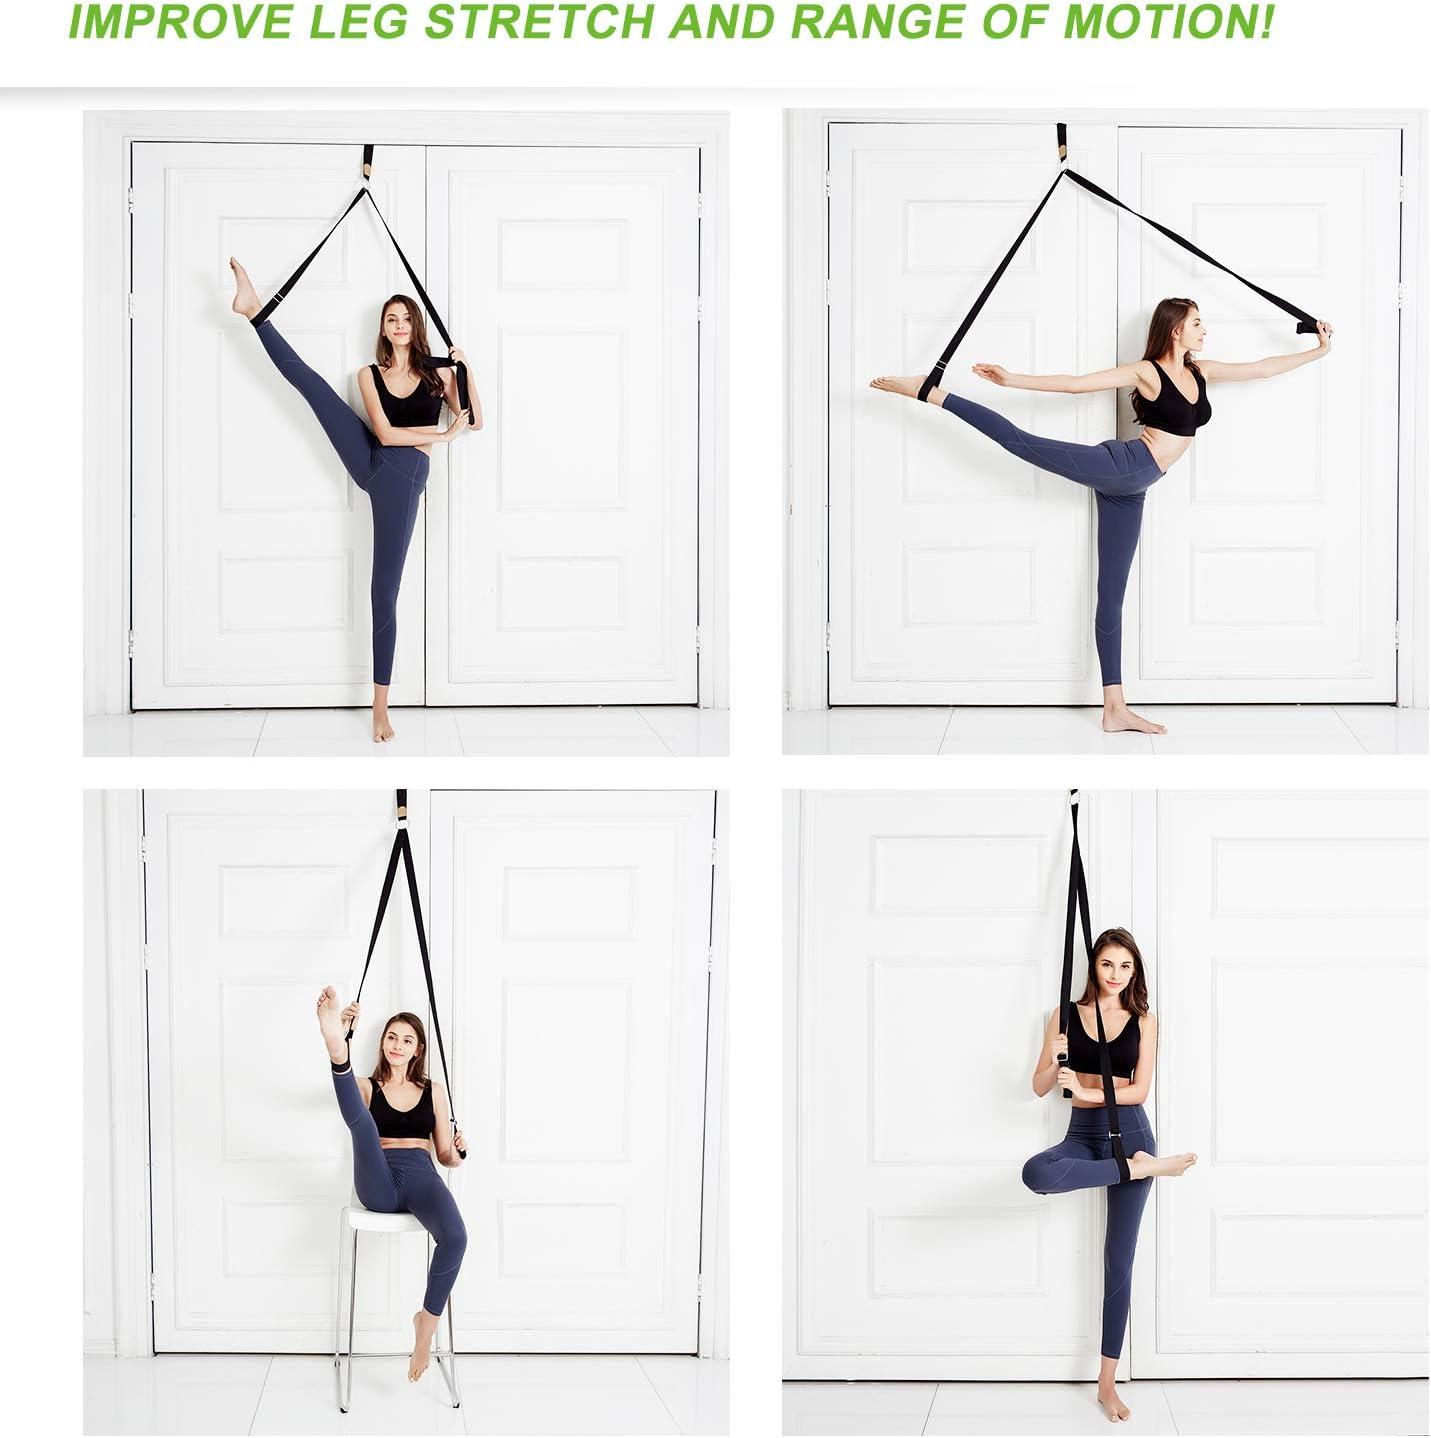 Leg Flexibility Door Stretcher Strap for Ballet Cheer Gymnastics Taekwondo Dancers with Detailed Exercise Instruction and a Portable Carry Bag UBING Leg Stretcher